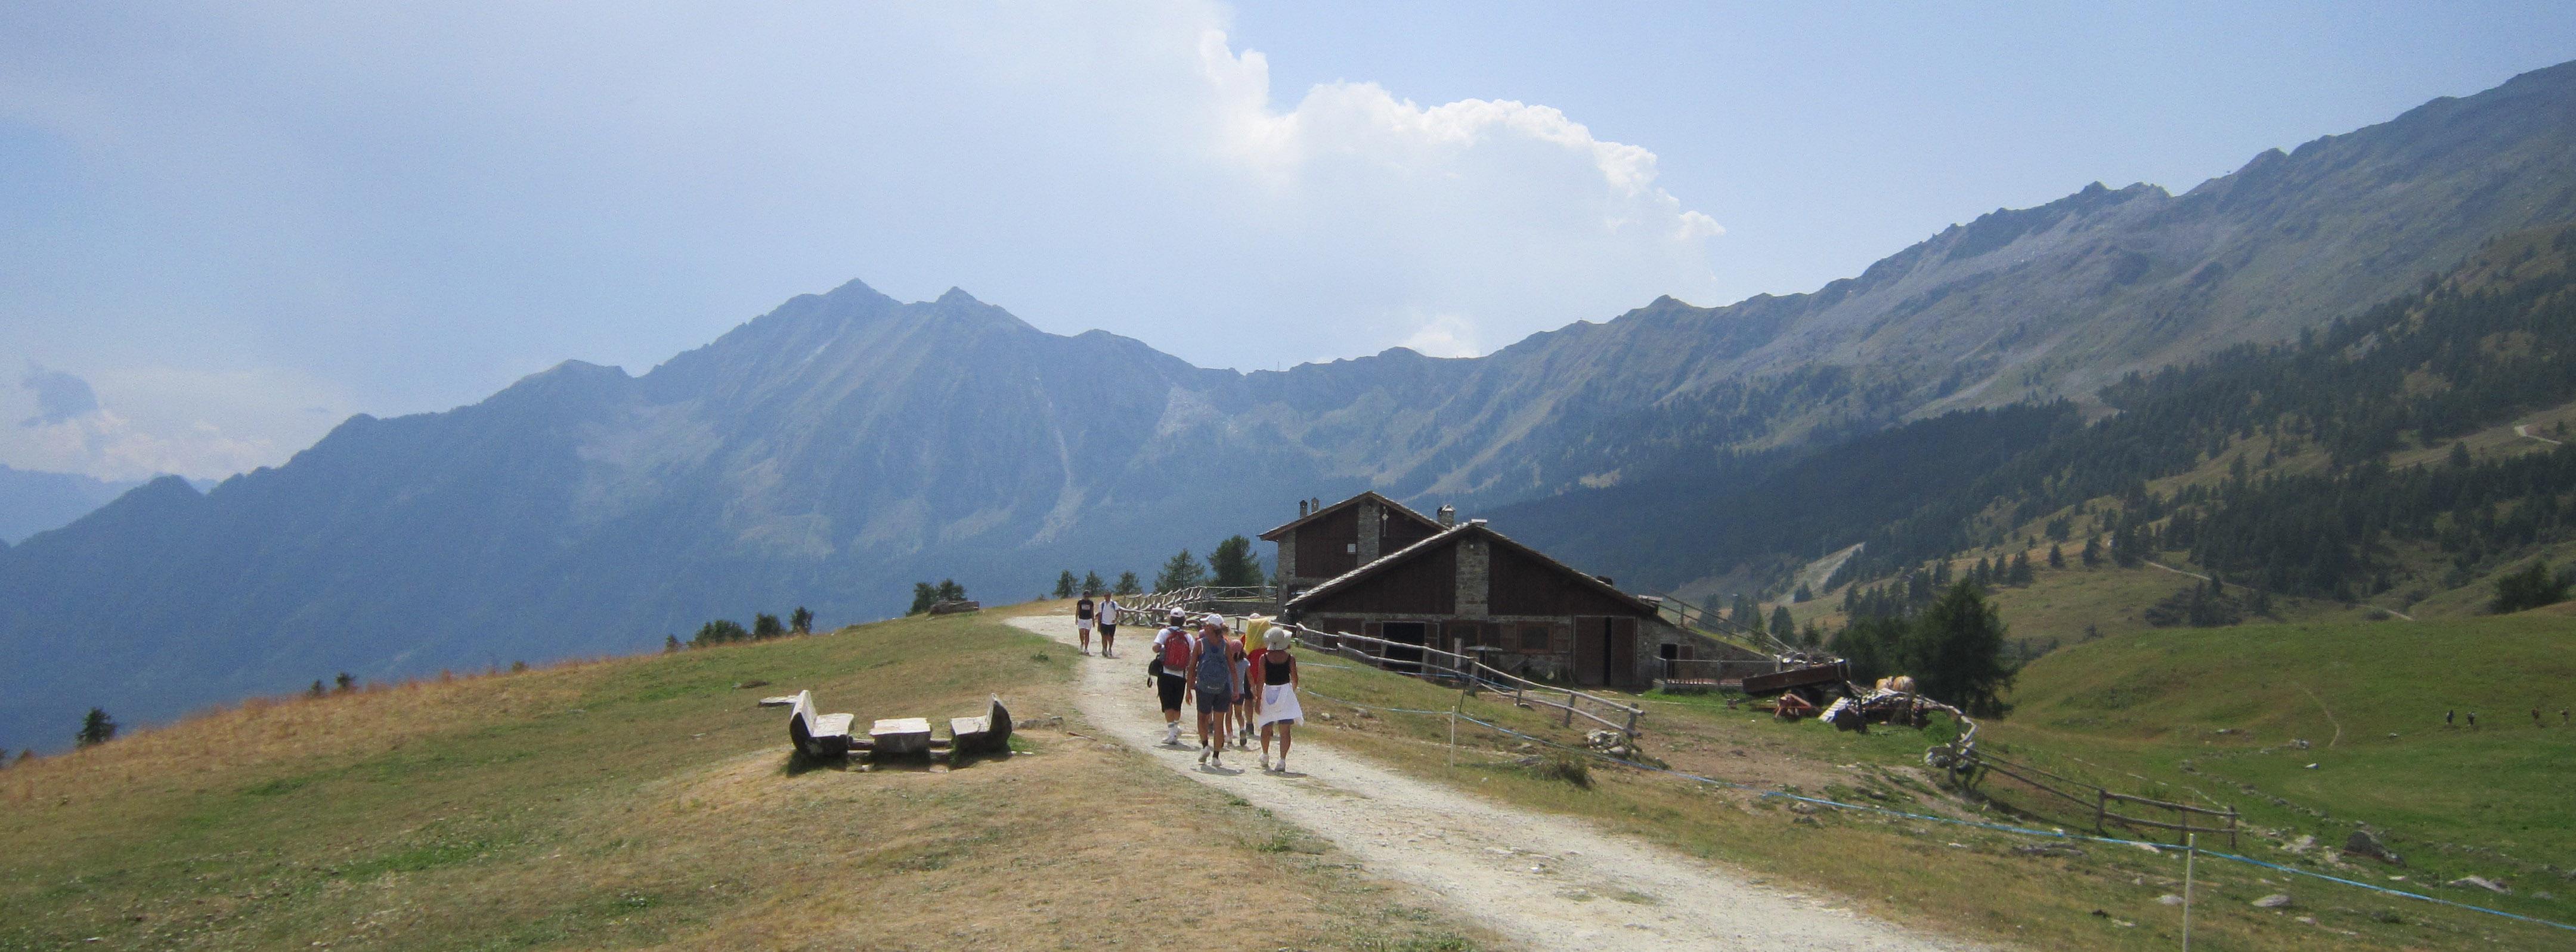 Vacanze in montagna